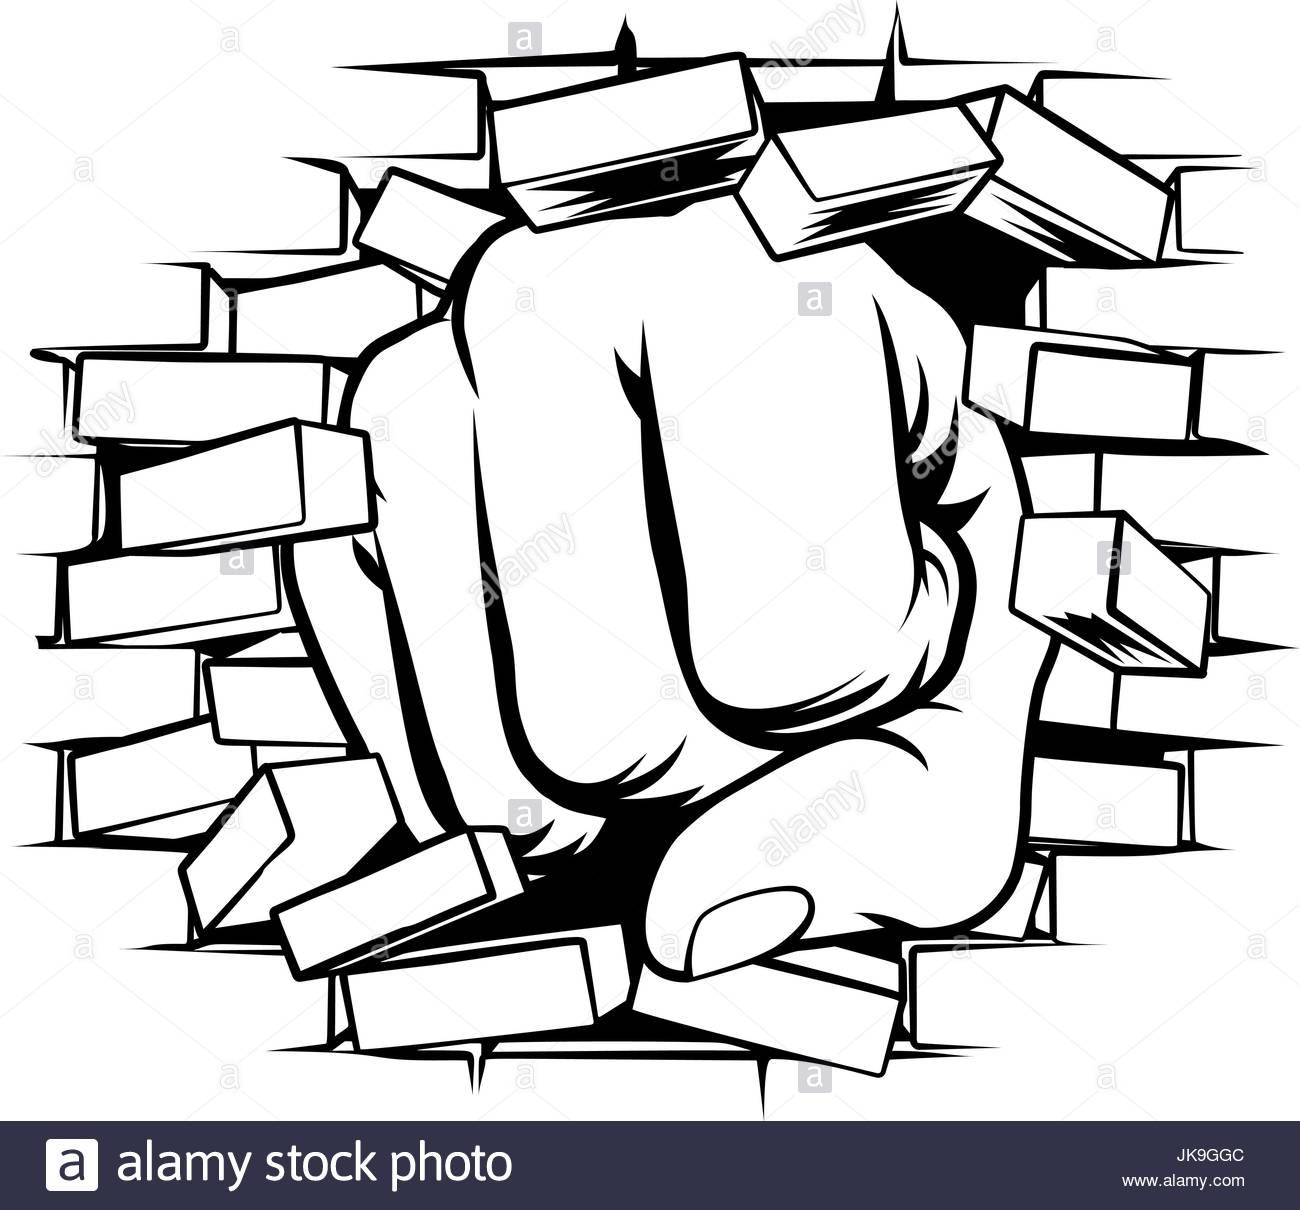 1300x1210 Fist Punching Through Brick Wall Stock Vector Art Amp Illustration